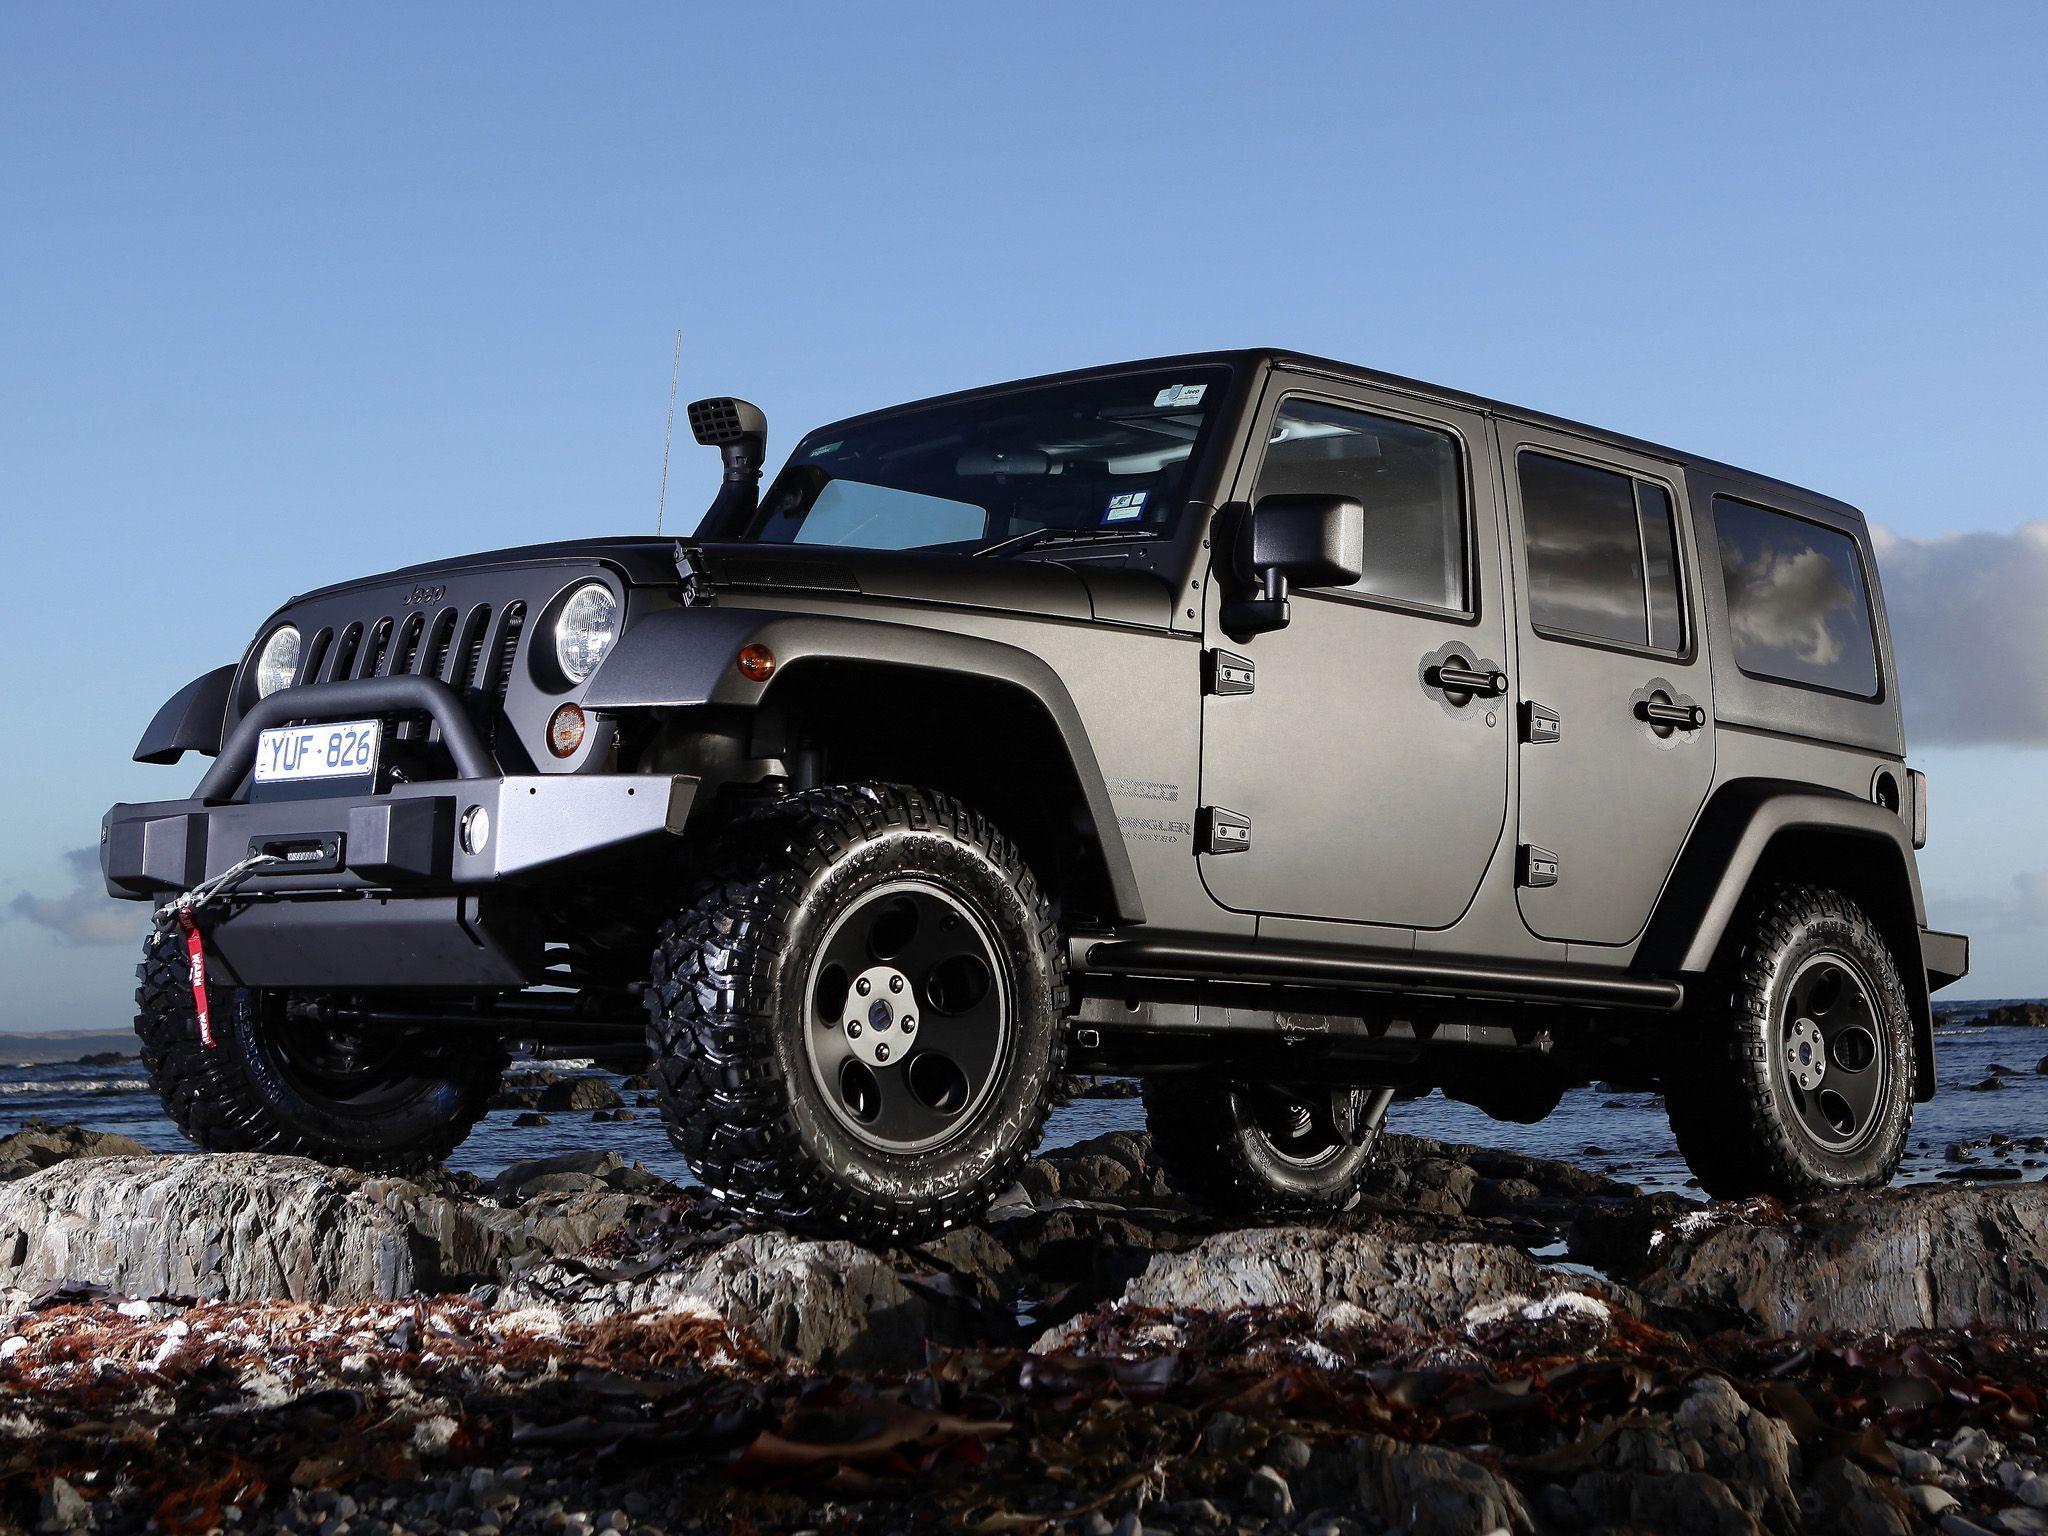 Jeep Wrangler Unlimited Rubicon Wallpaper Hd Resolution